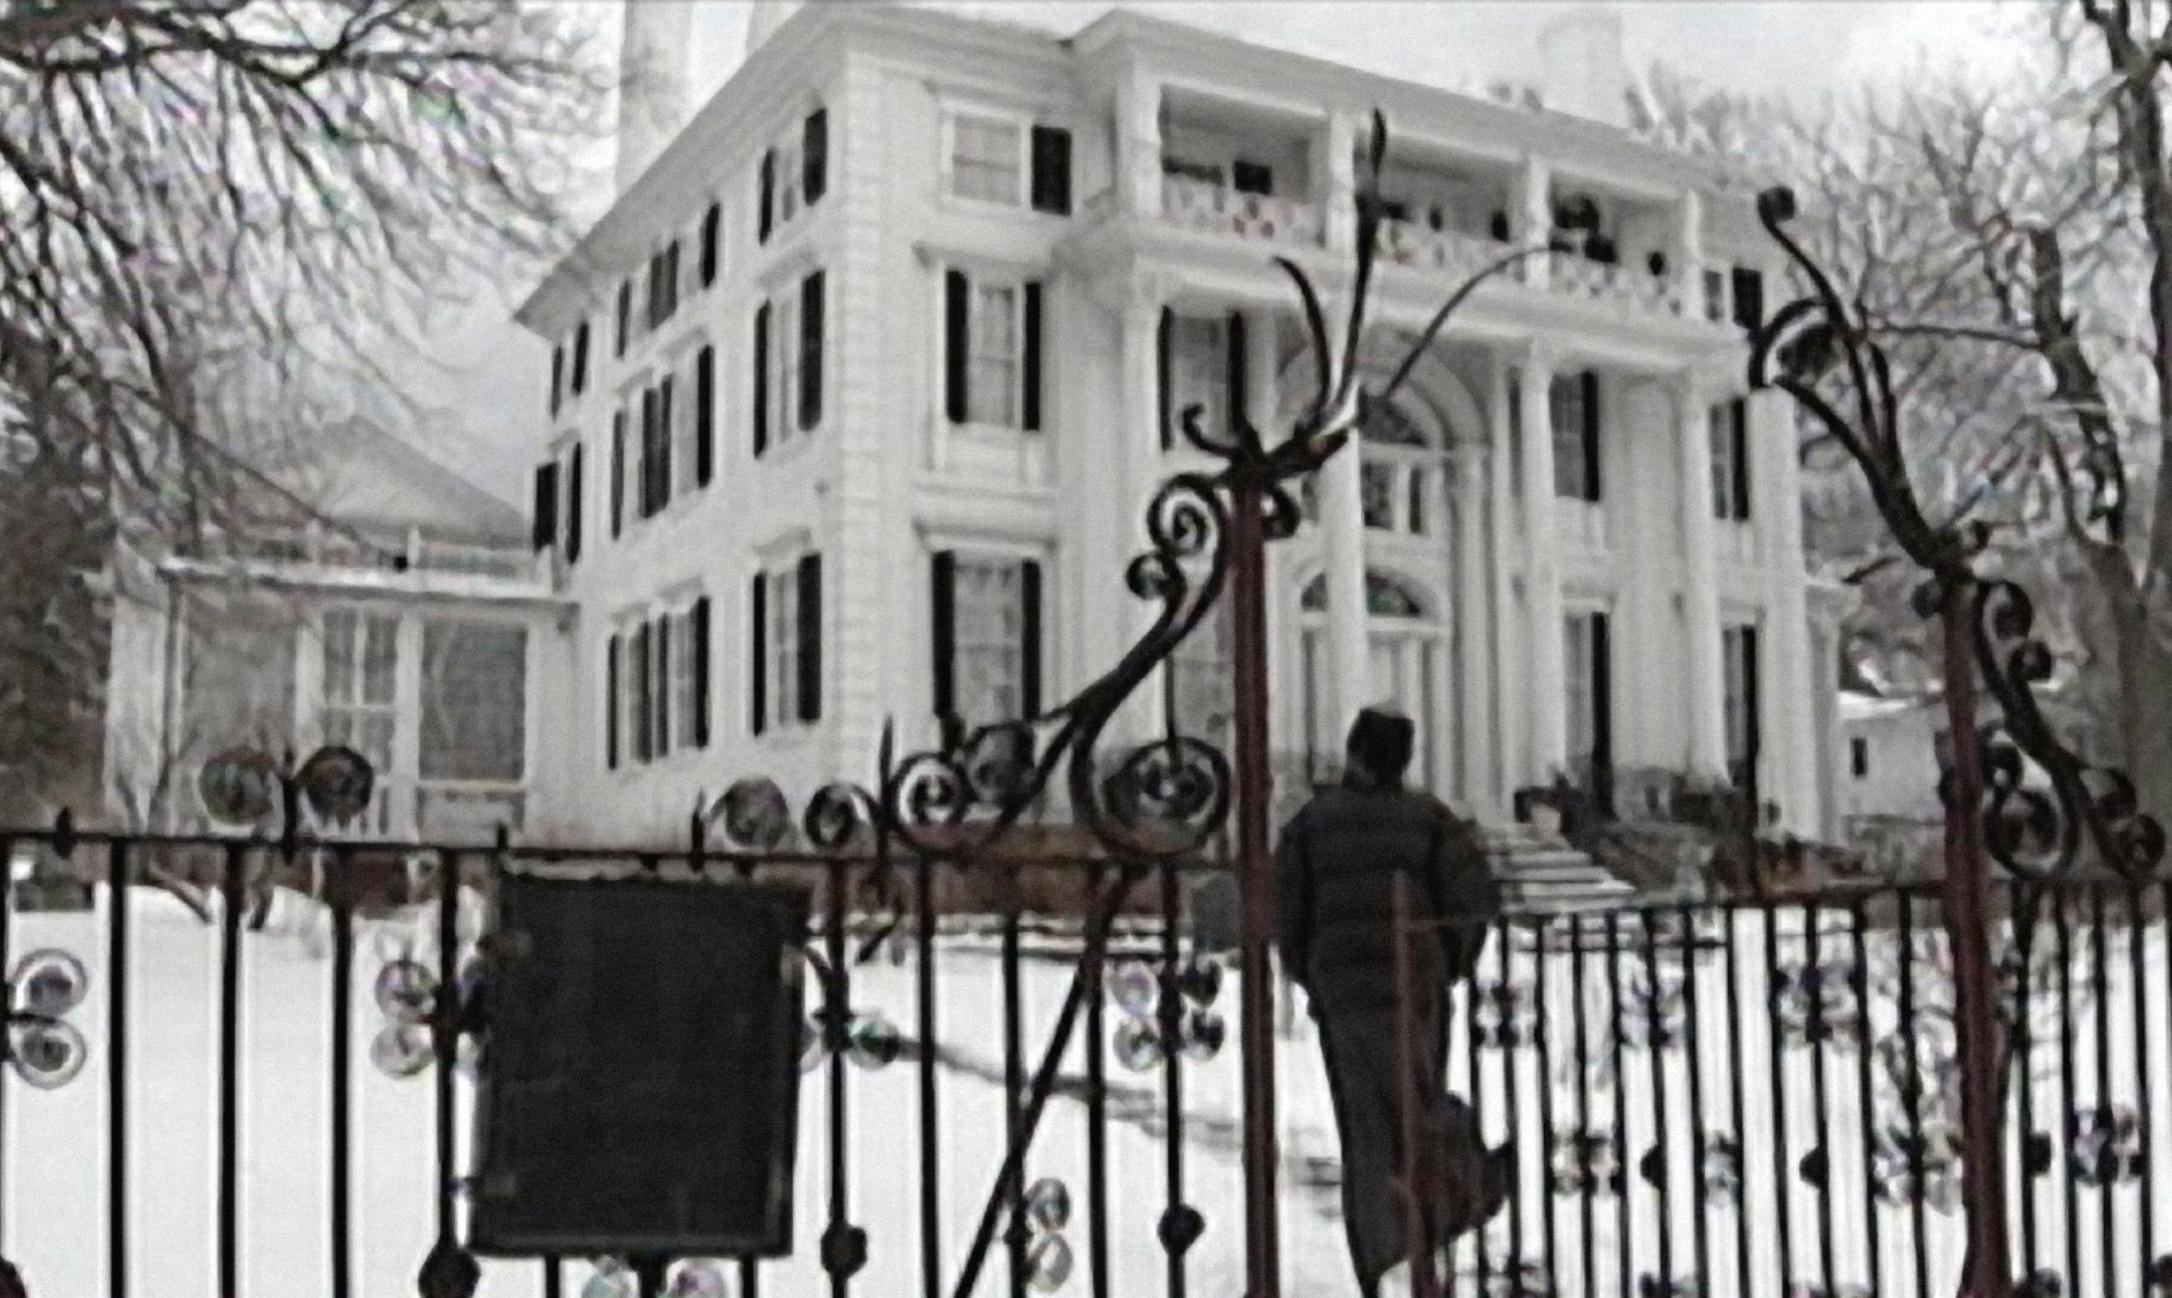 The DeWolfe family's 1810 mansion in Bristol, RI